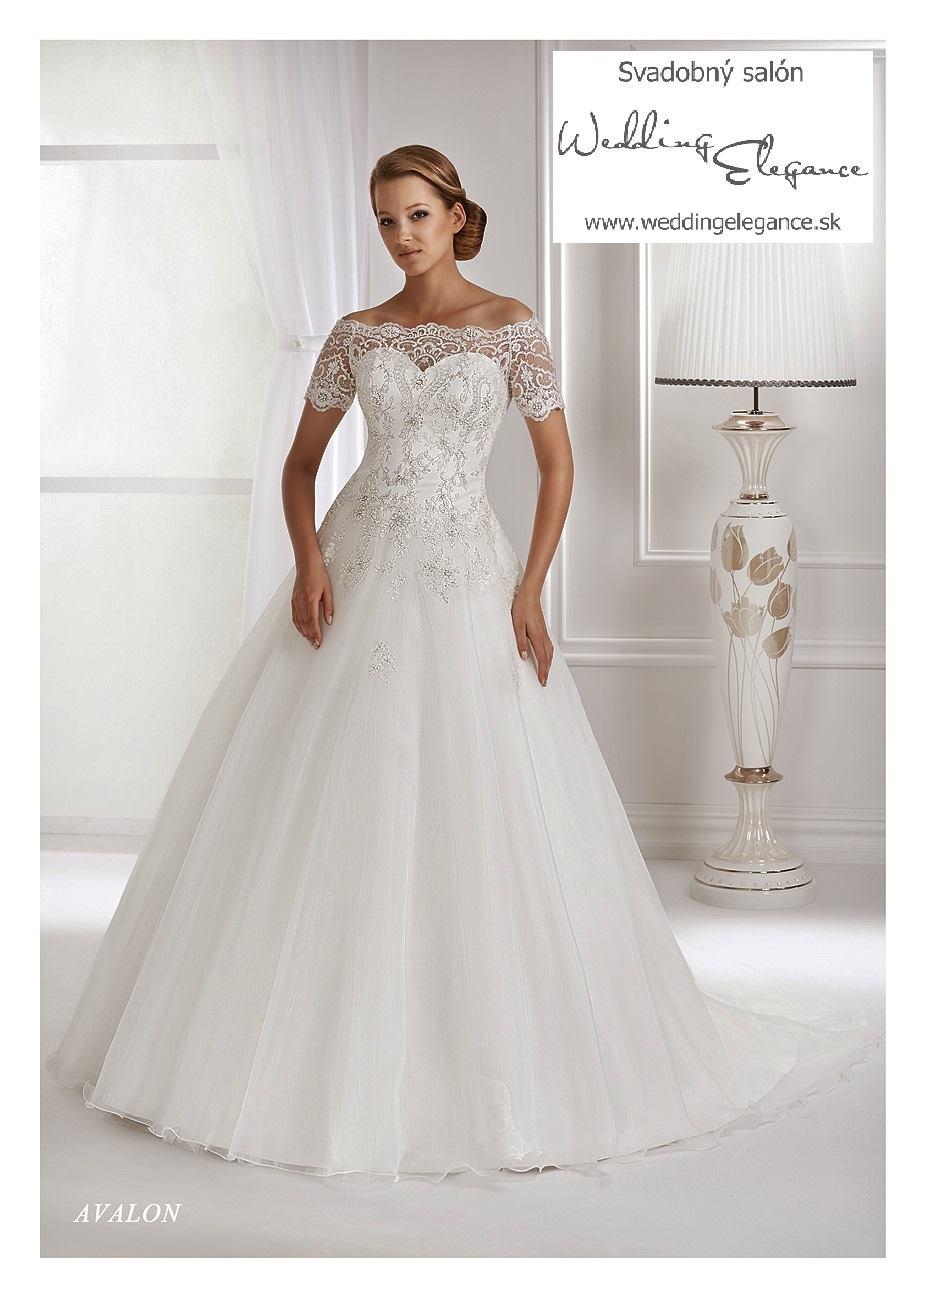 Svadobné šatičky - www.weddingelegance.sk